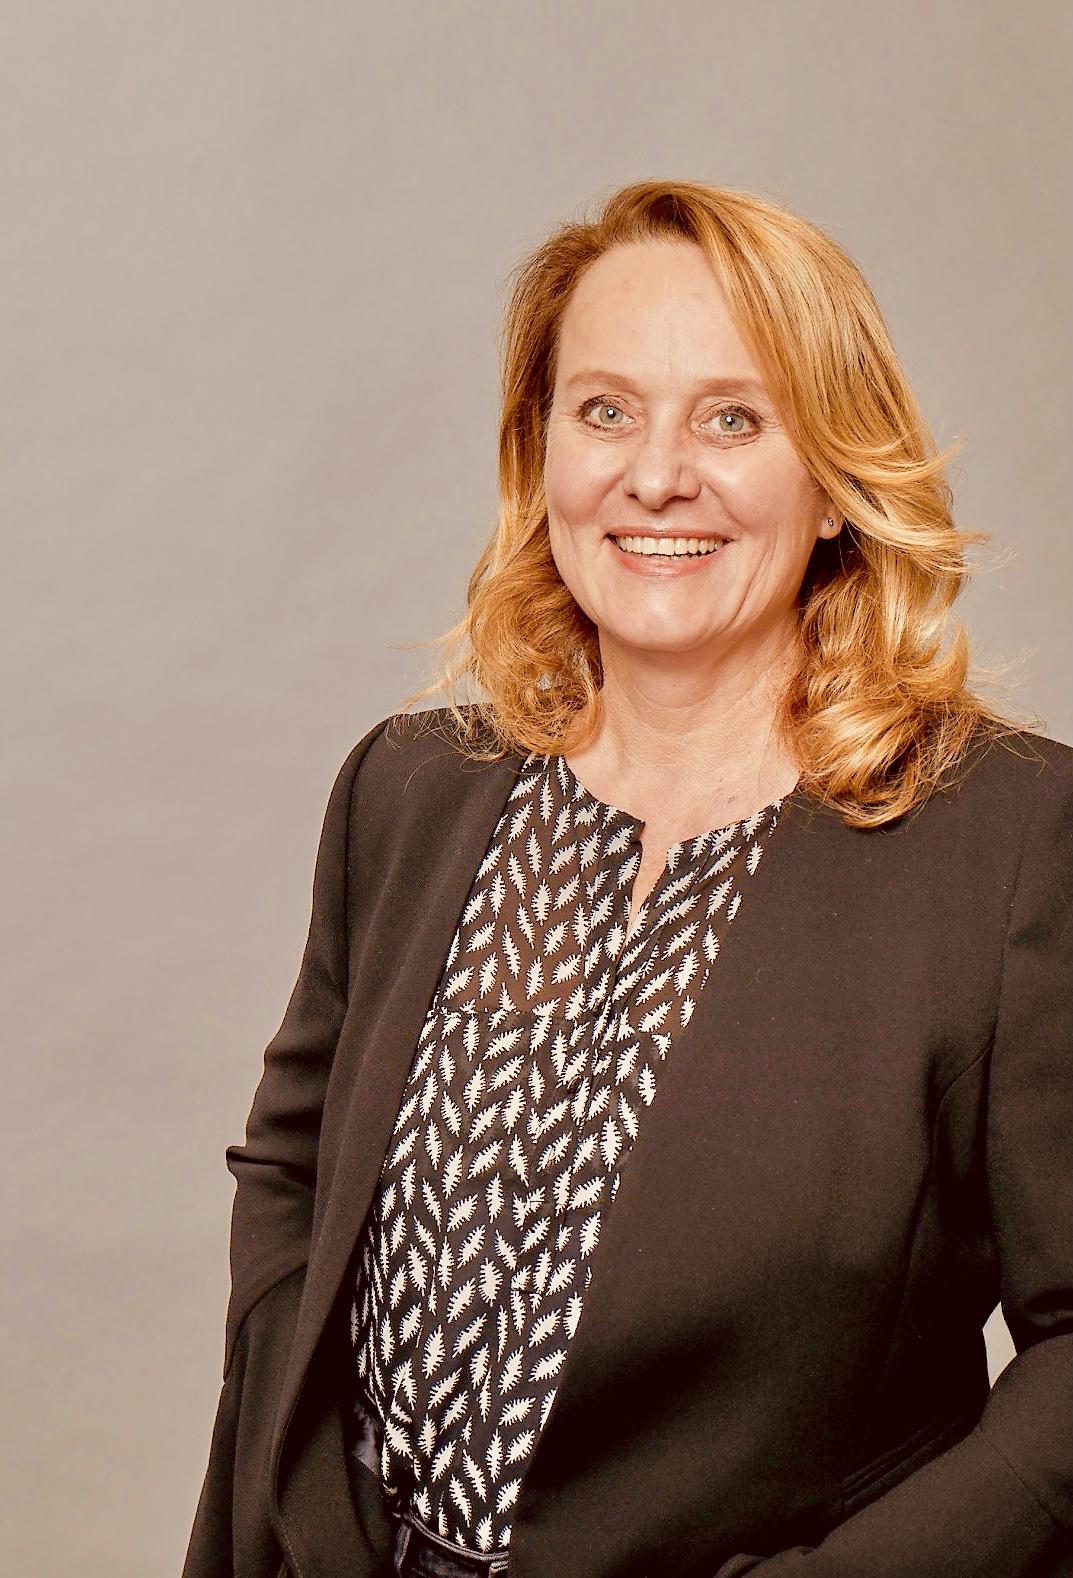 Claudia Corrmann, MdL